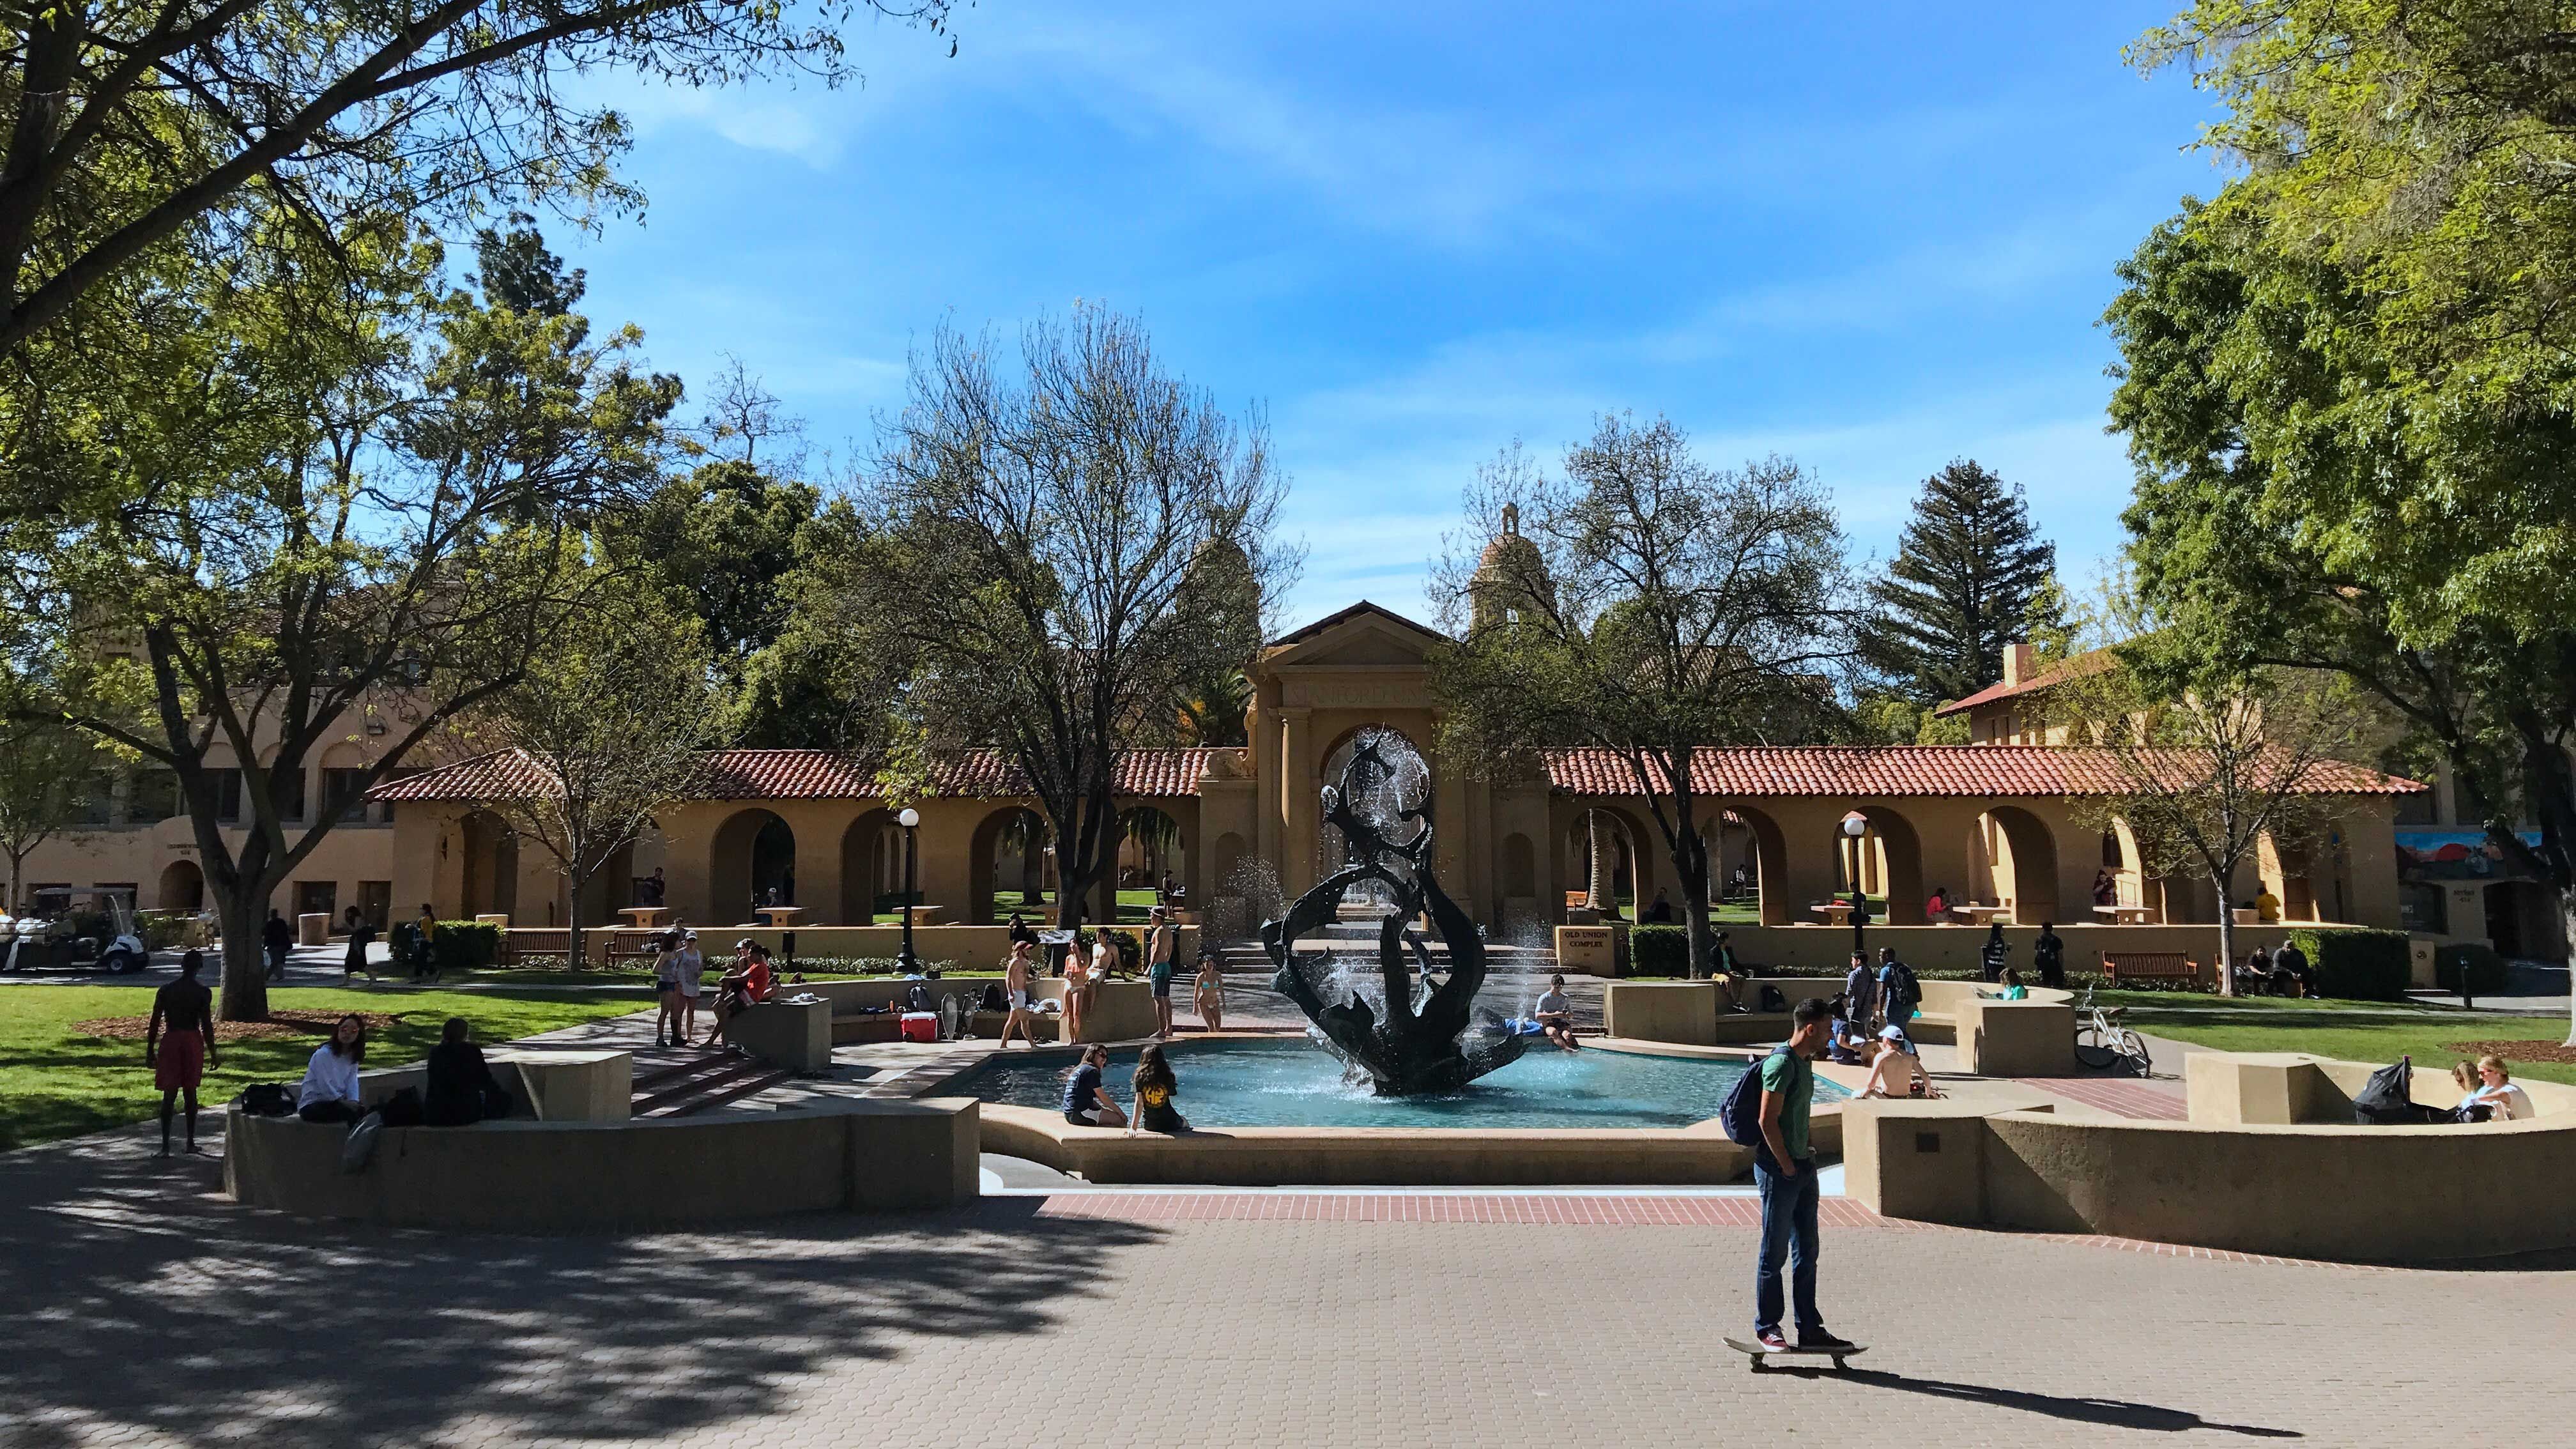 About Stanford | Стэнфордский университет, Университет